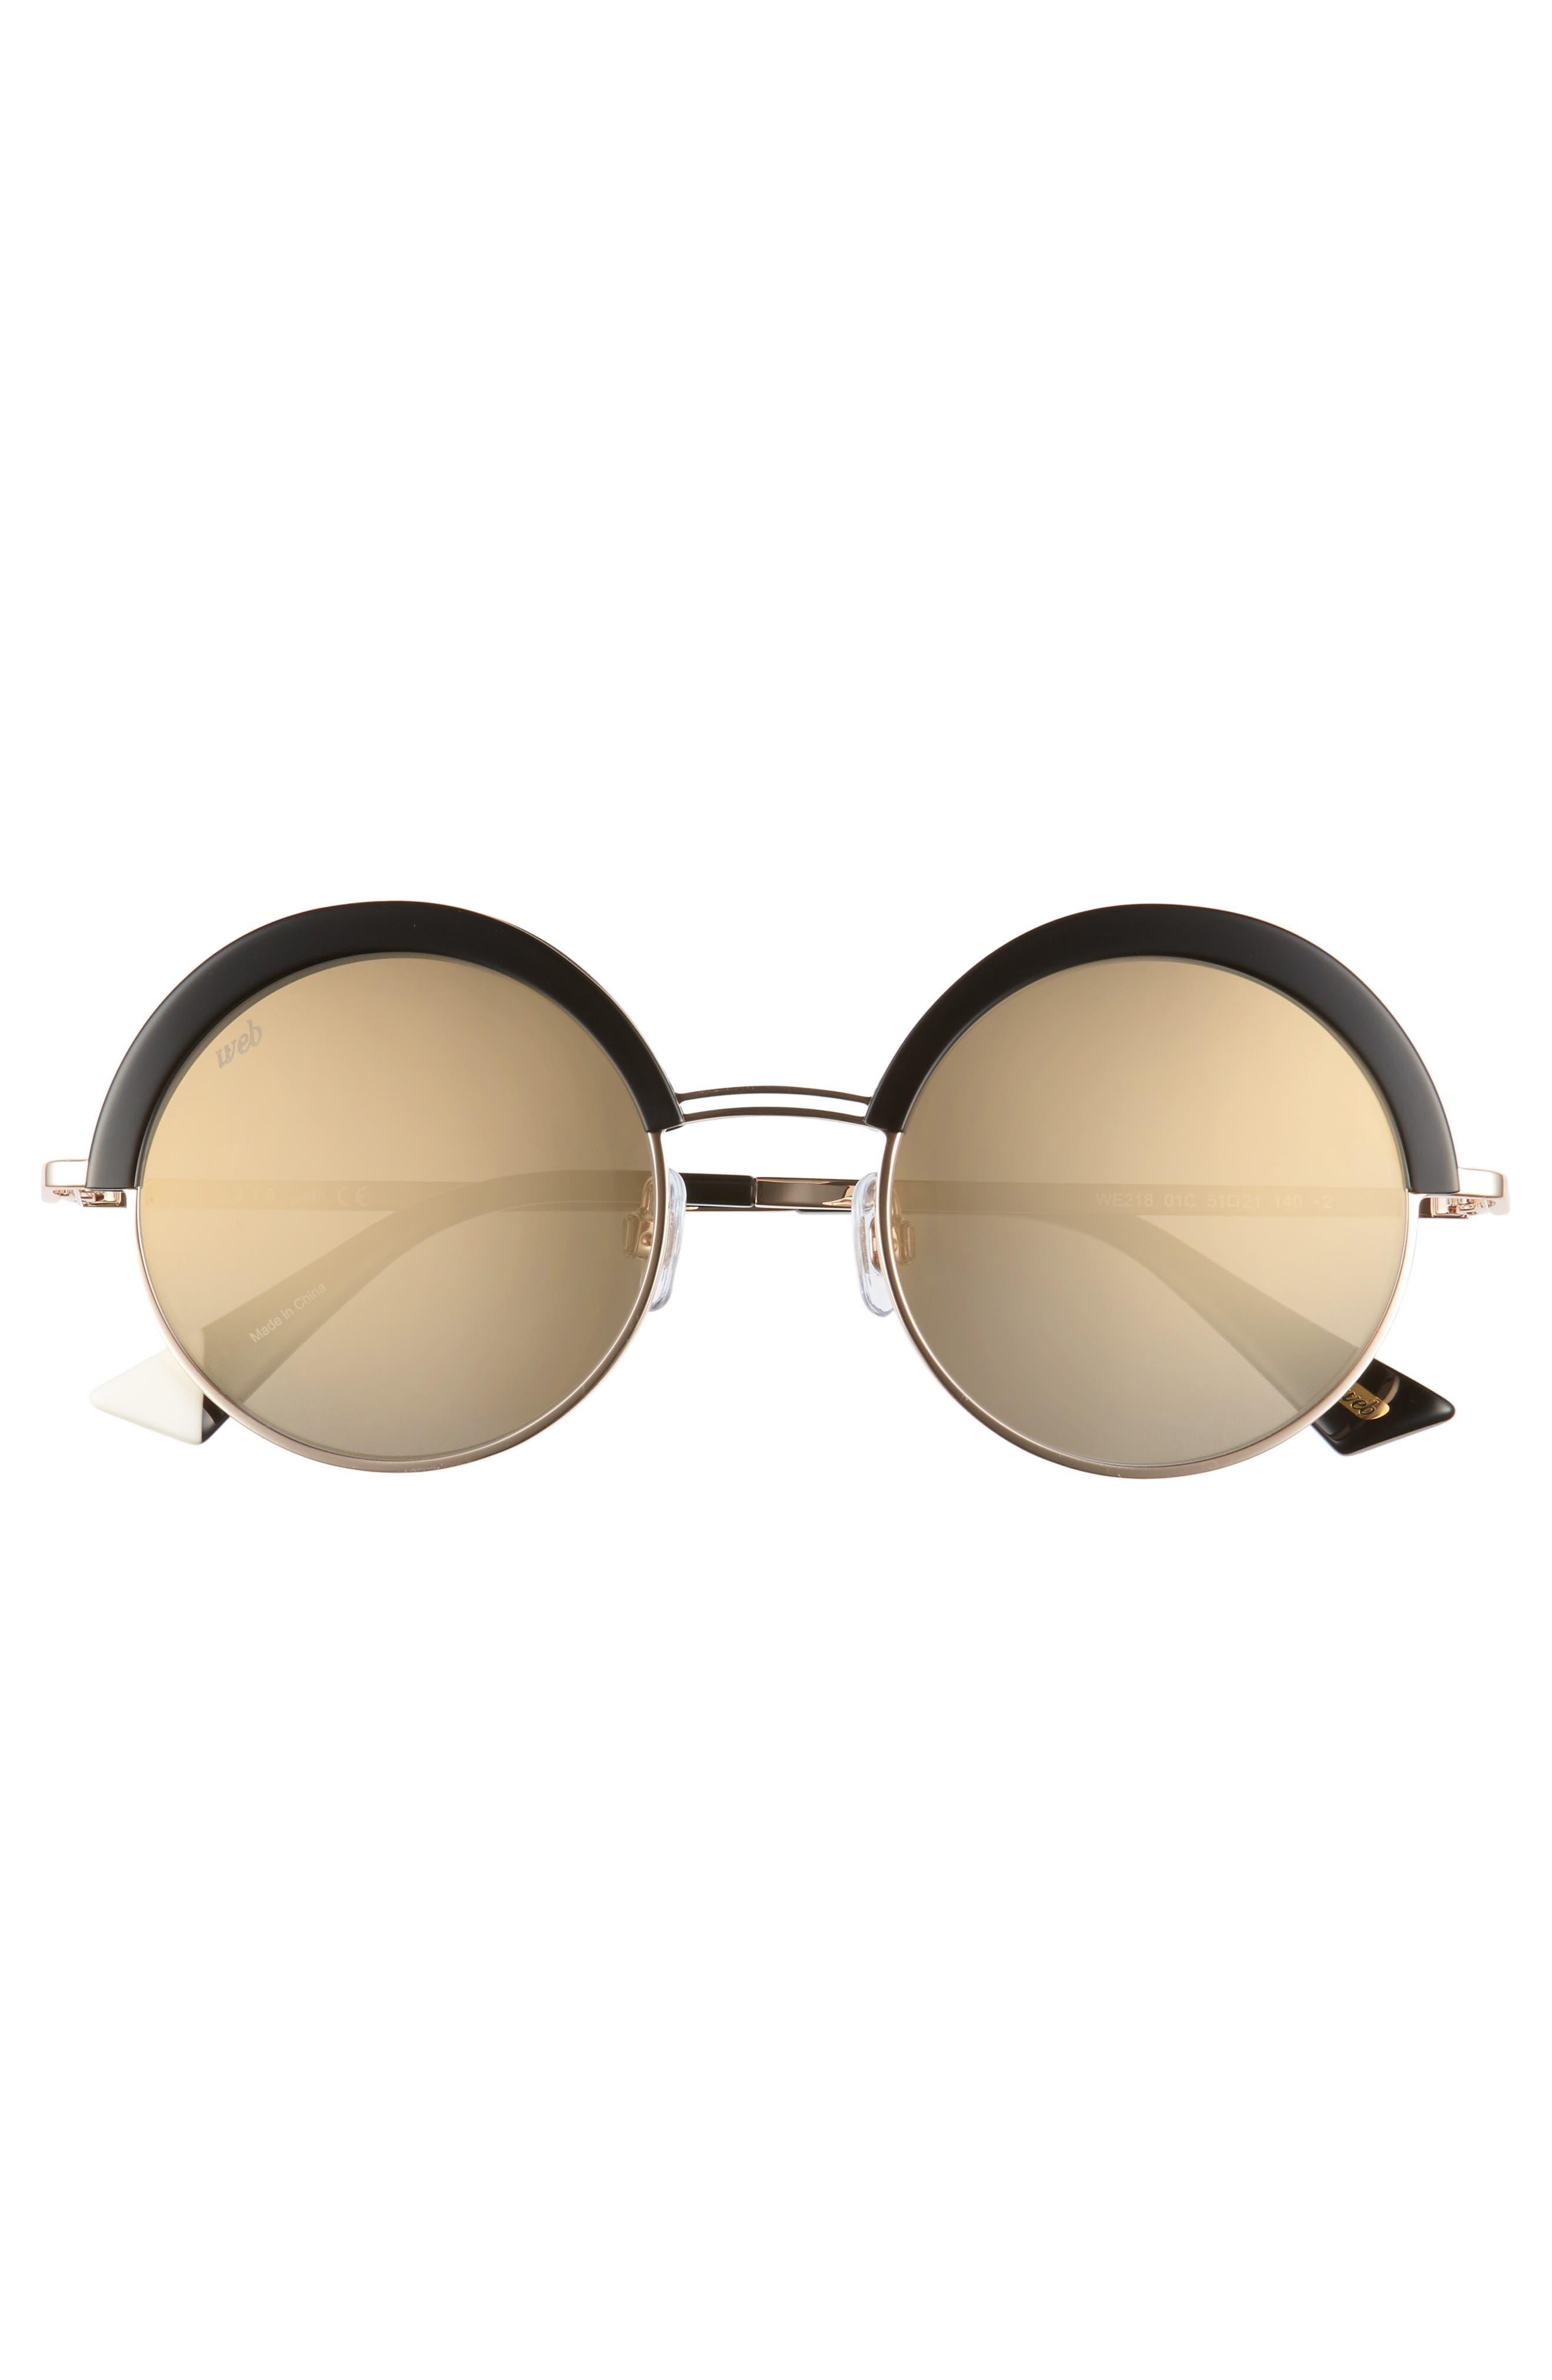 51mm Round Sunglasses,                             Alternate thumbnail 3, color,                             SHINY BLACK/ SMOKE MIRROR